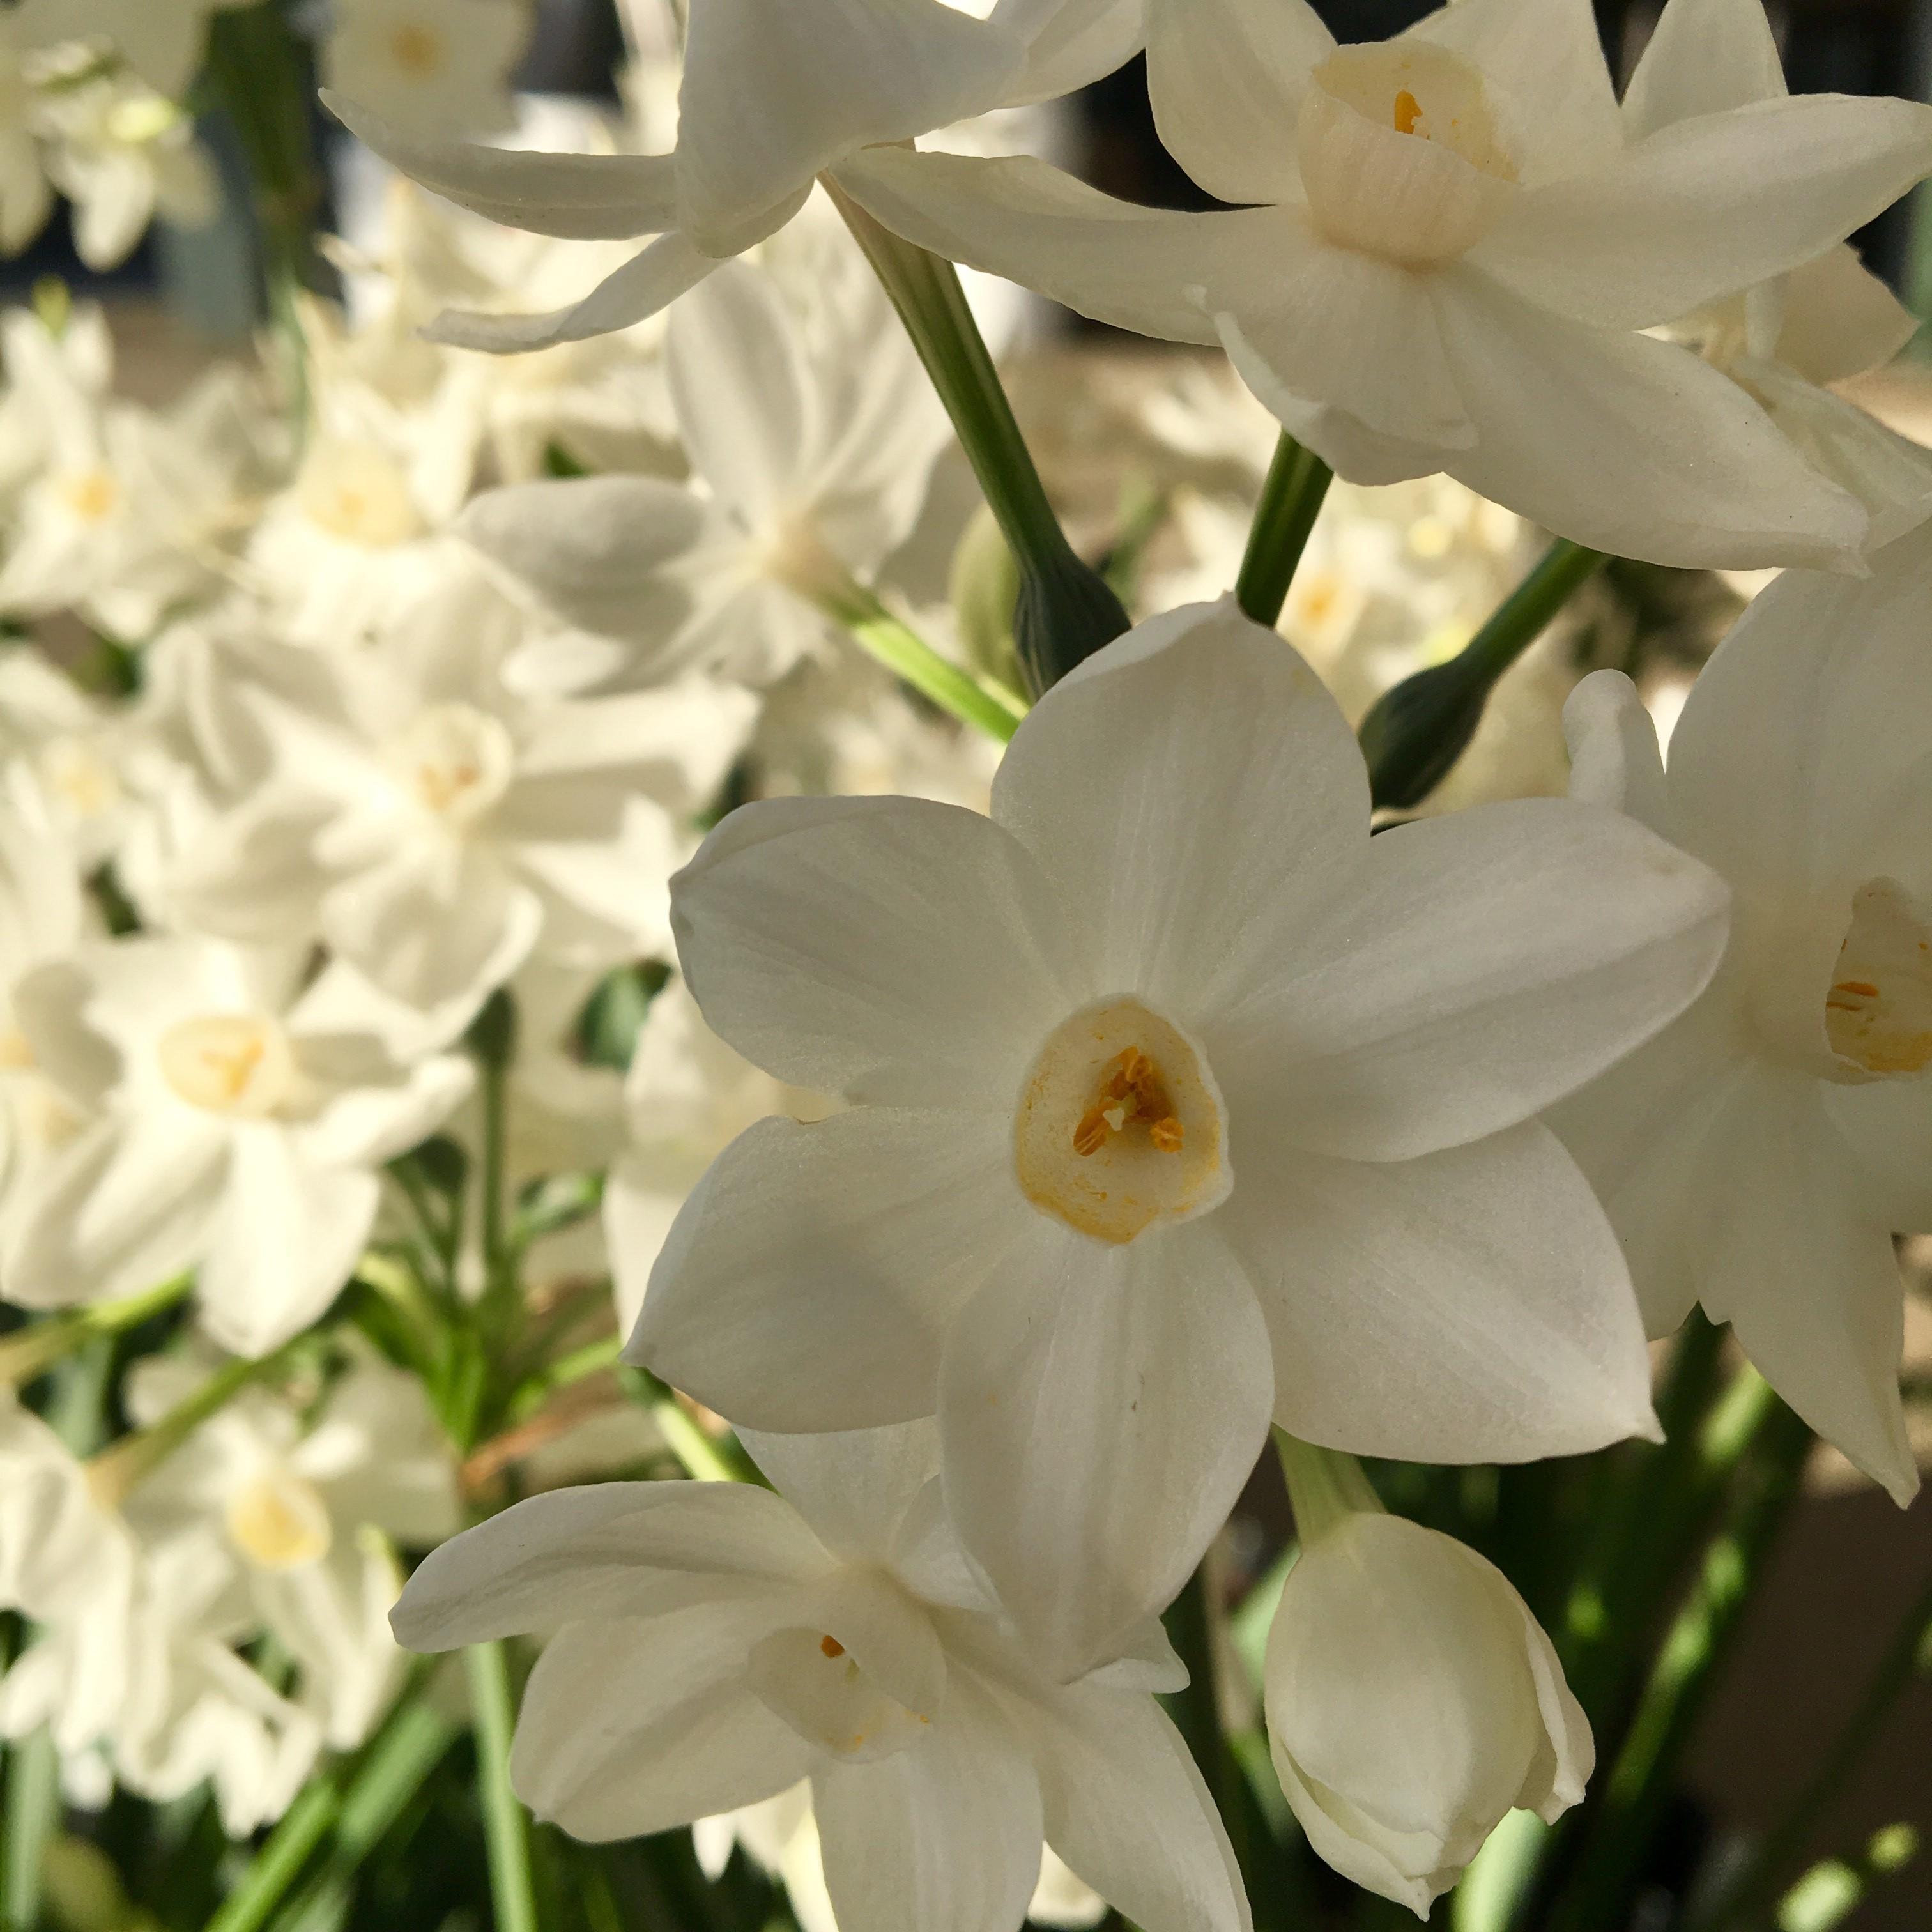 Narcissus image